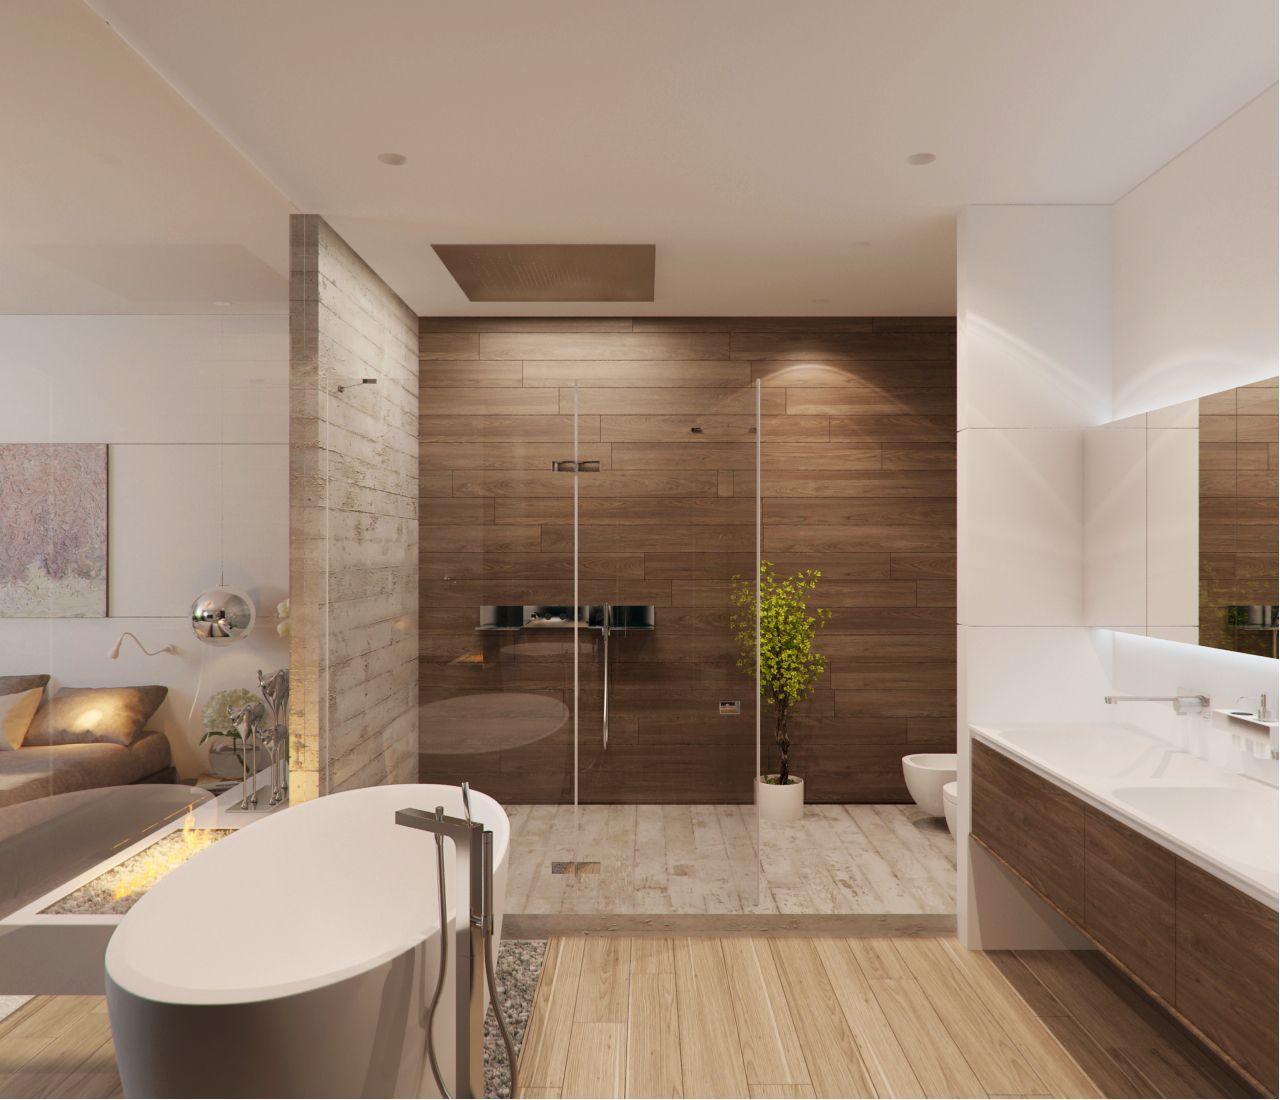 Moderne Badezimmer Glas With Images Top Bathroom Design Bathroom Design Bathrooms Remodel